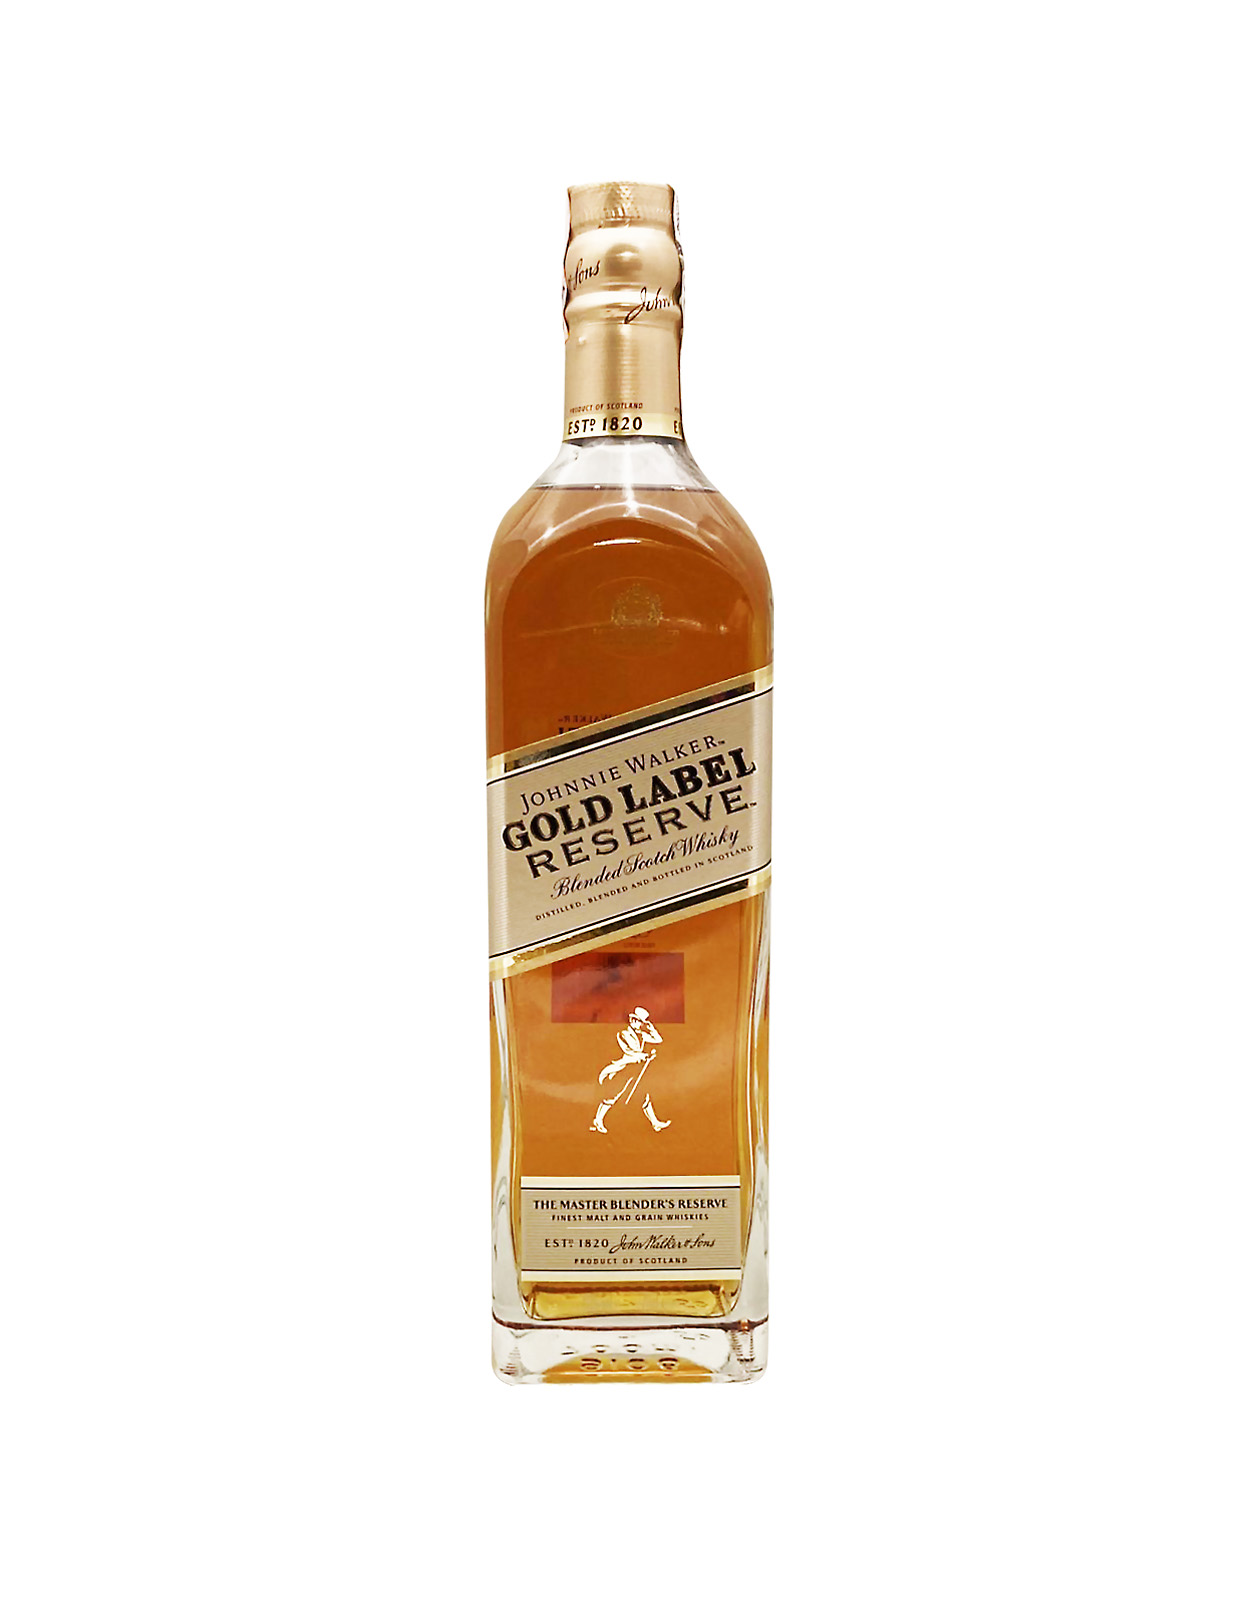 Johnnie Walker Gold Label 40%, Bottleshop Sunny wines slnecnice mesto, petrzalka, Škótska Whisky, rozvoz alkoholu, eshop